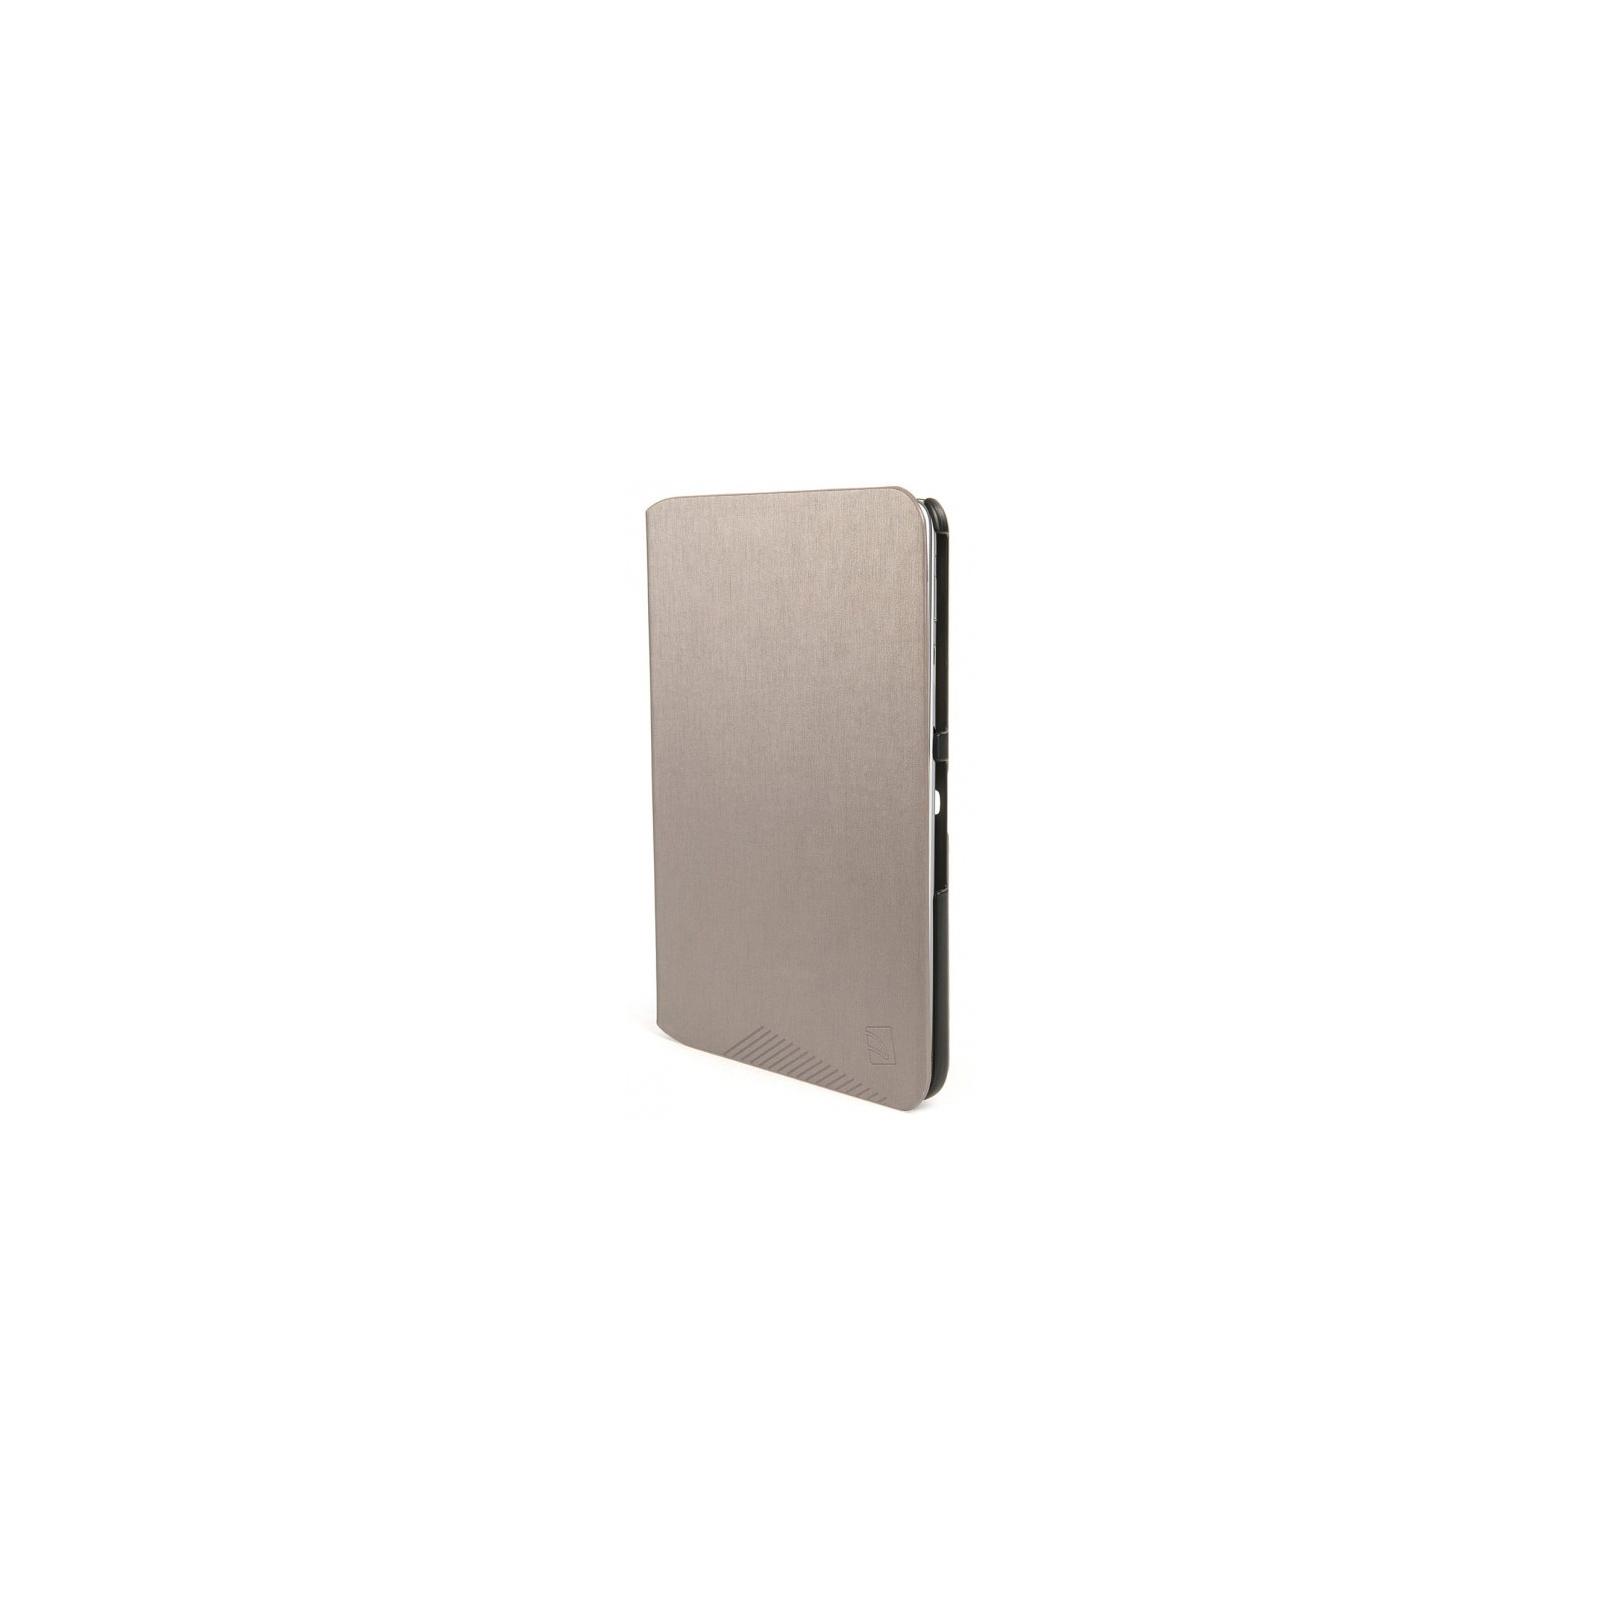 Чехол для планшета Tucano Galaxy Tab3 10.1 Macro (TAB-MS310-G) изображение 3